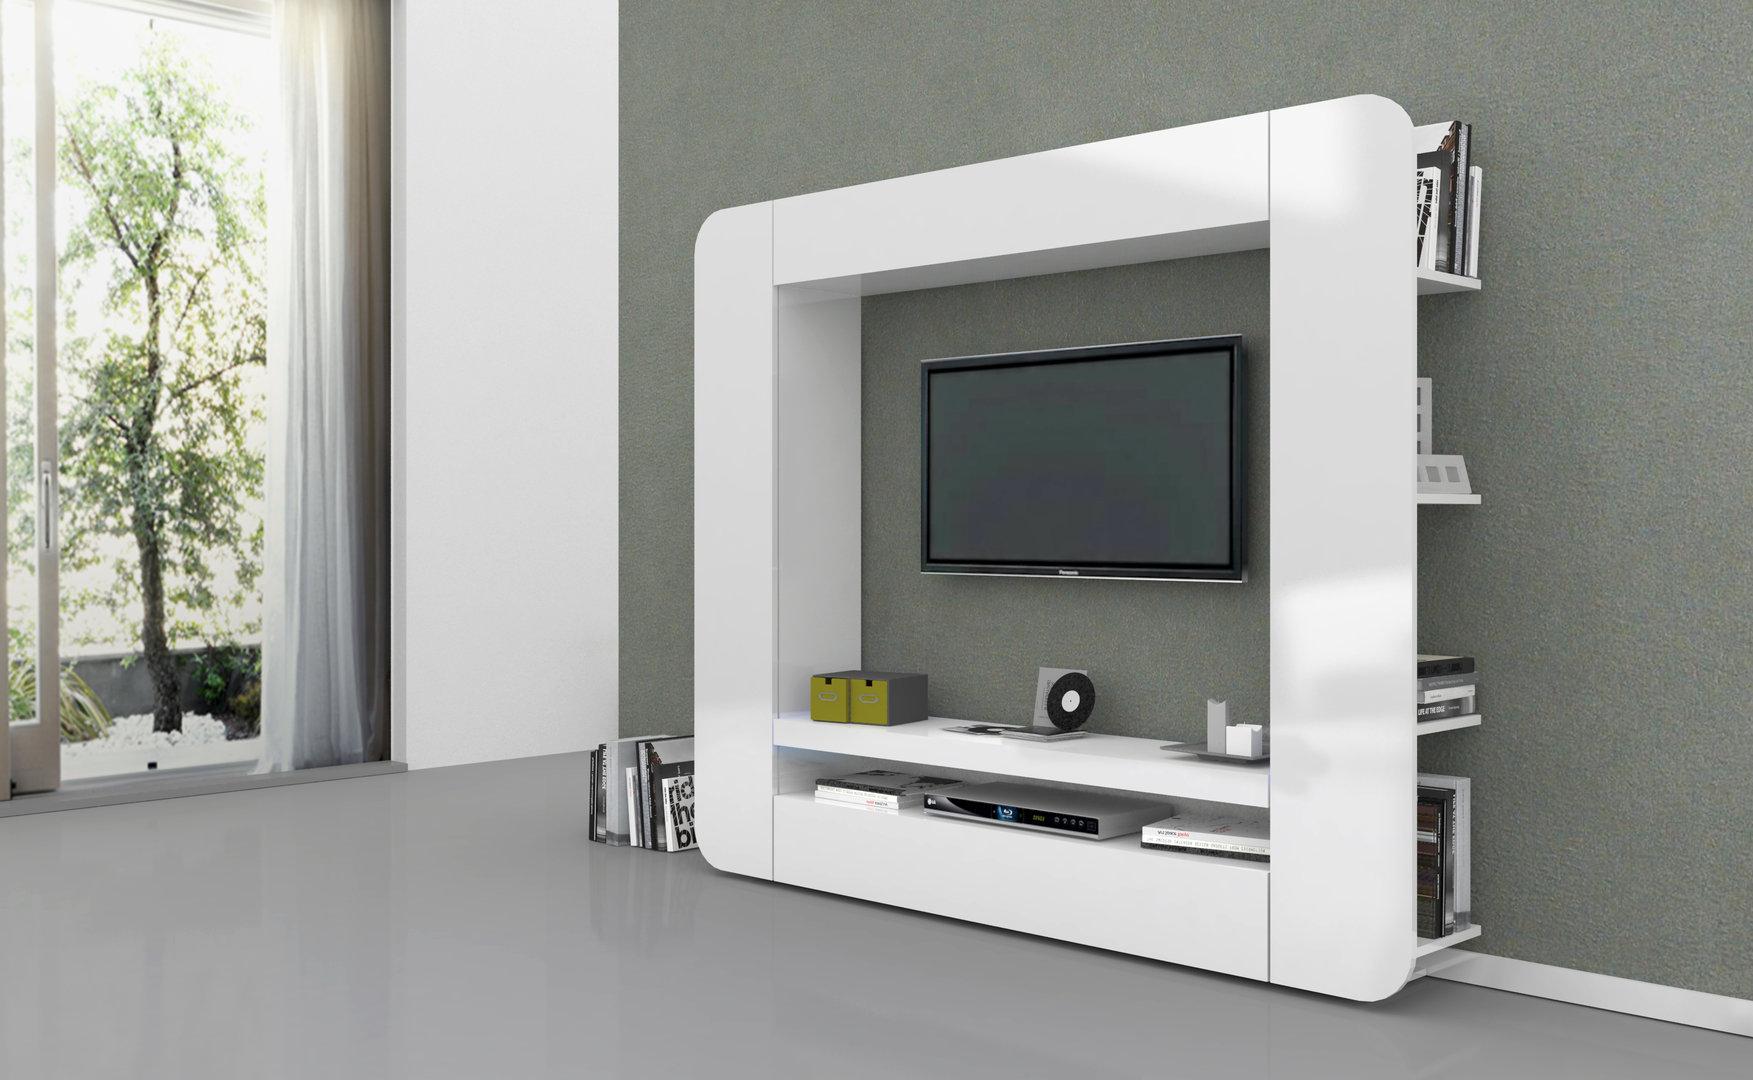 Soggiorno bianco o antracite zurigo mobile porta tv moderno - Mobile tv moderno ...